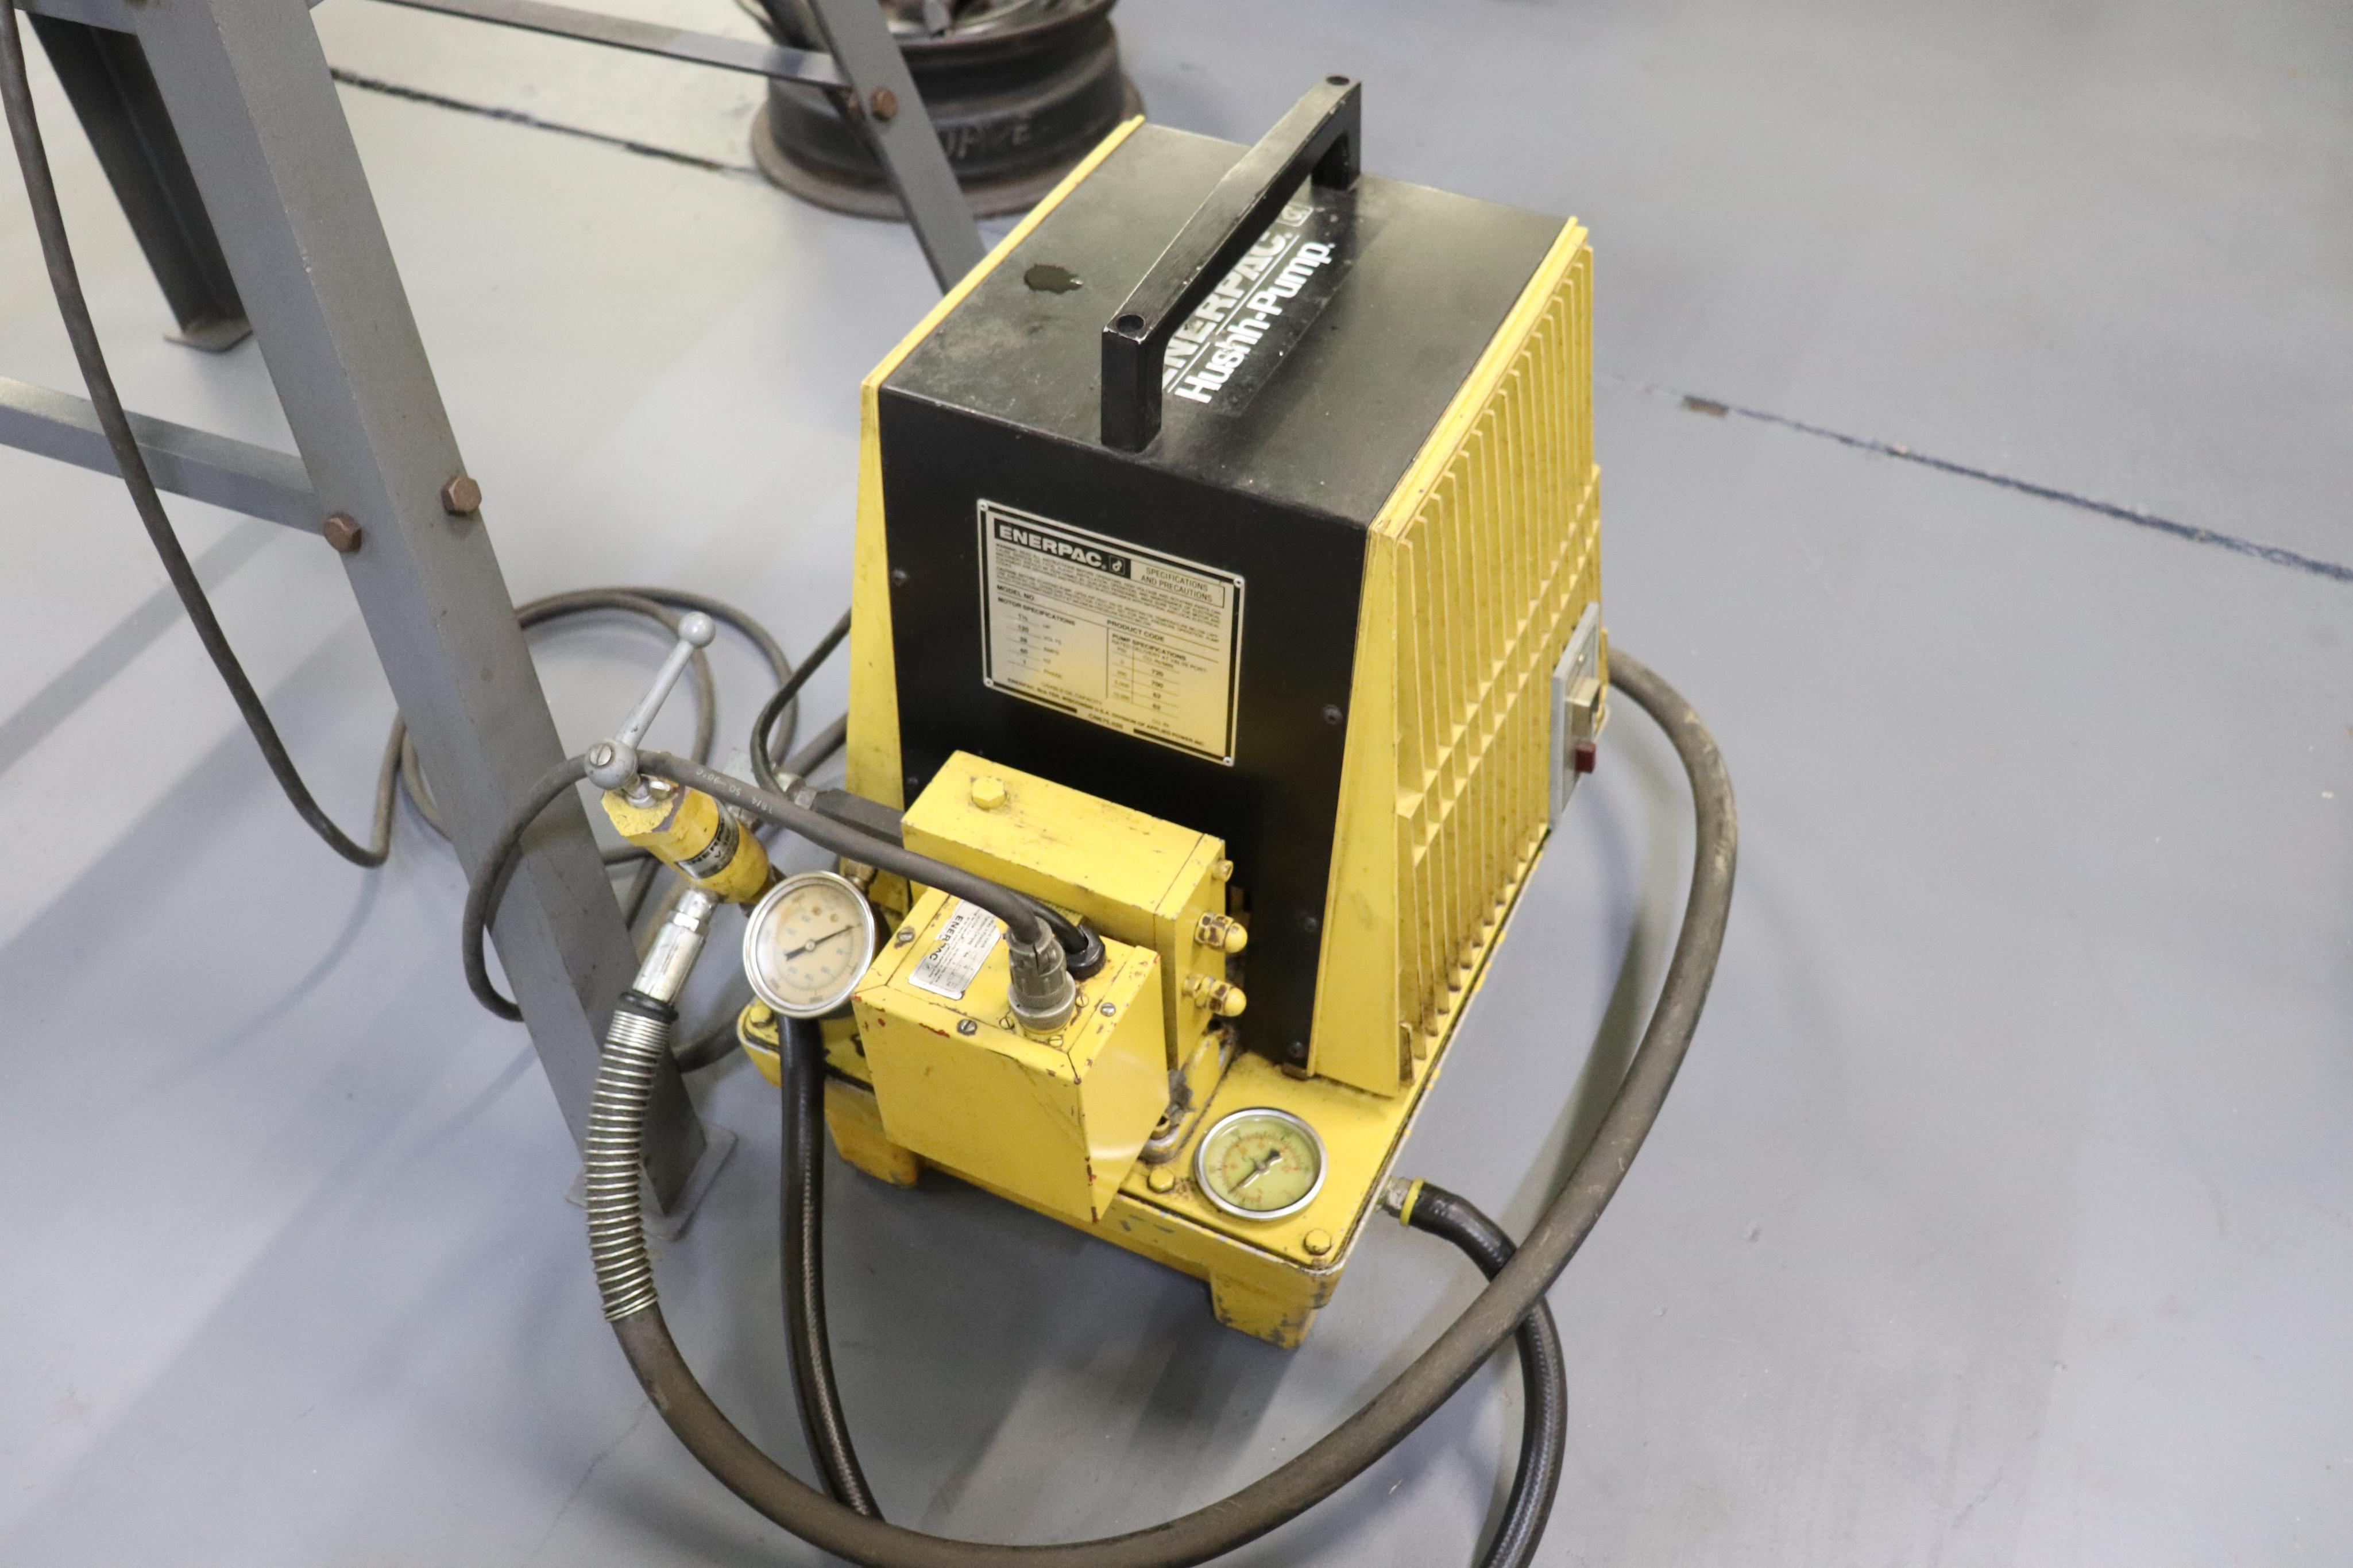 Enerpac Hush pump w/ C frame press - Image 4 of 8